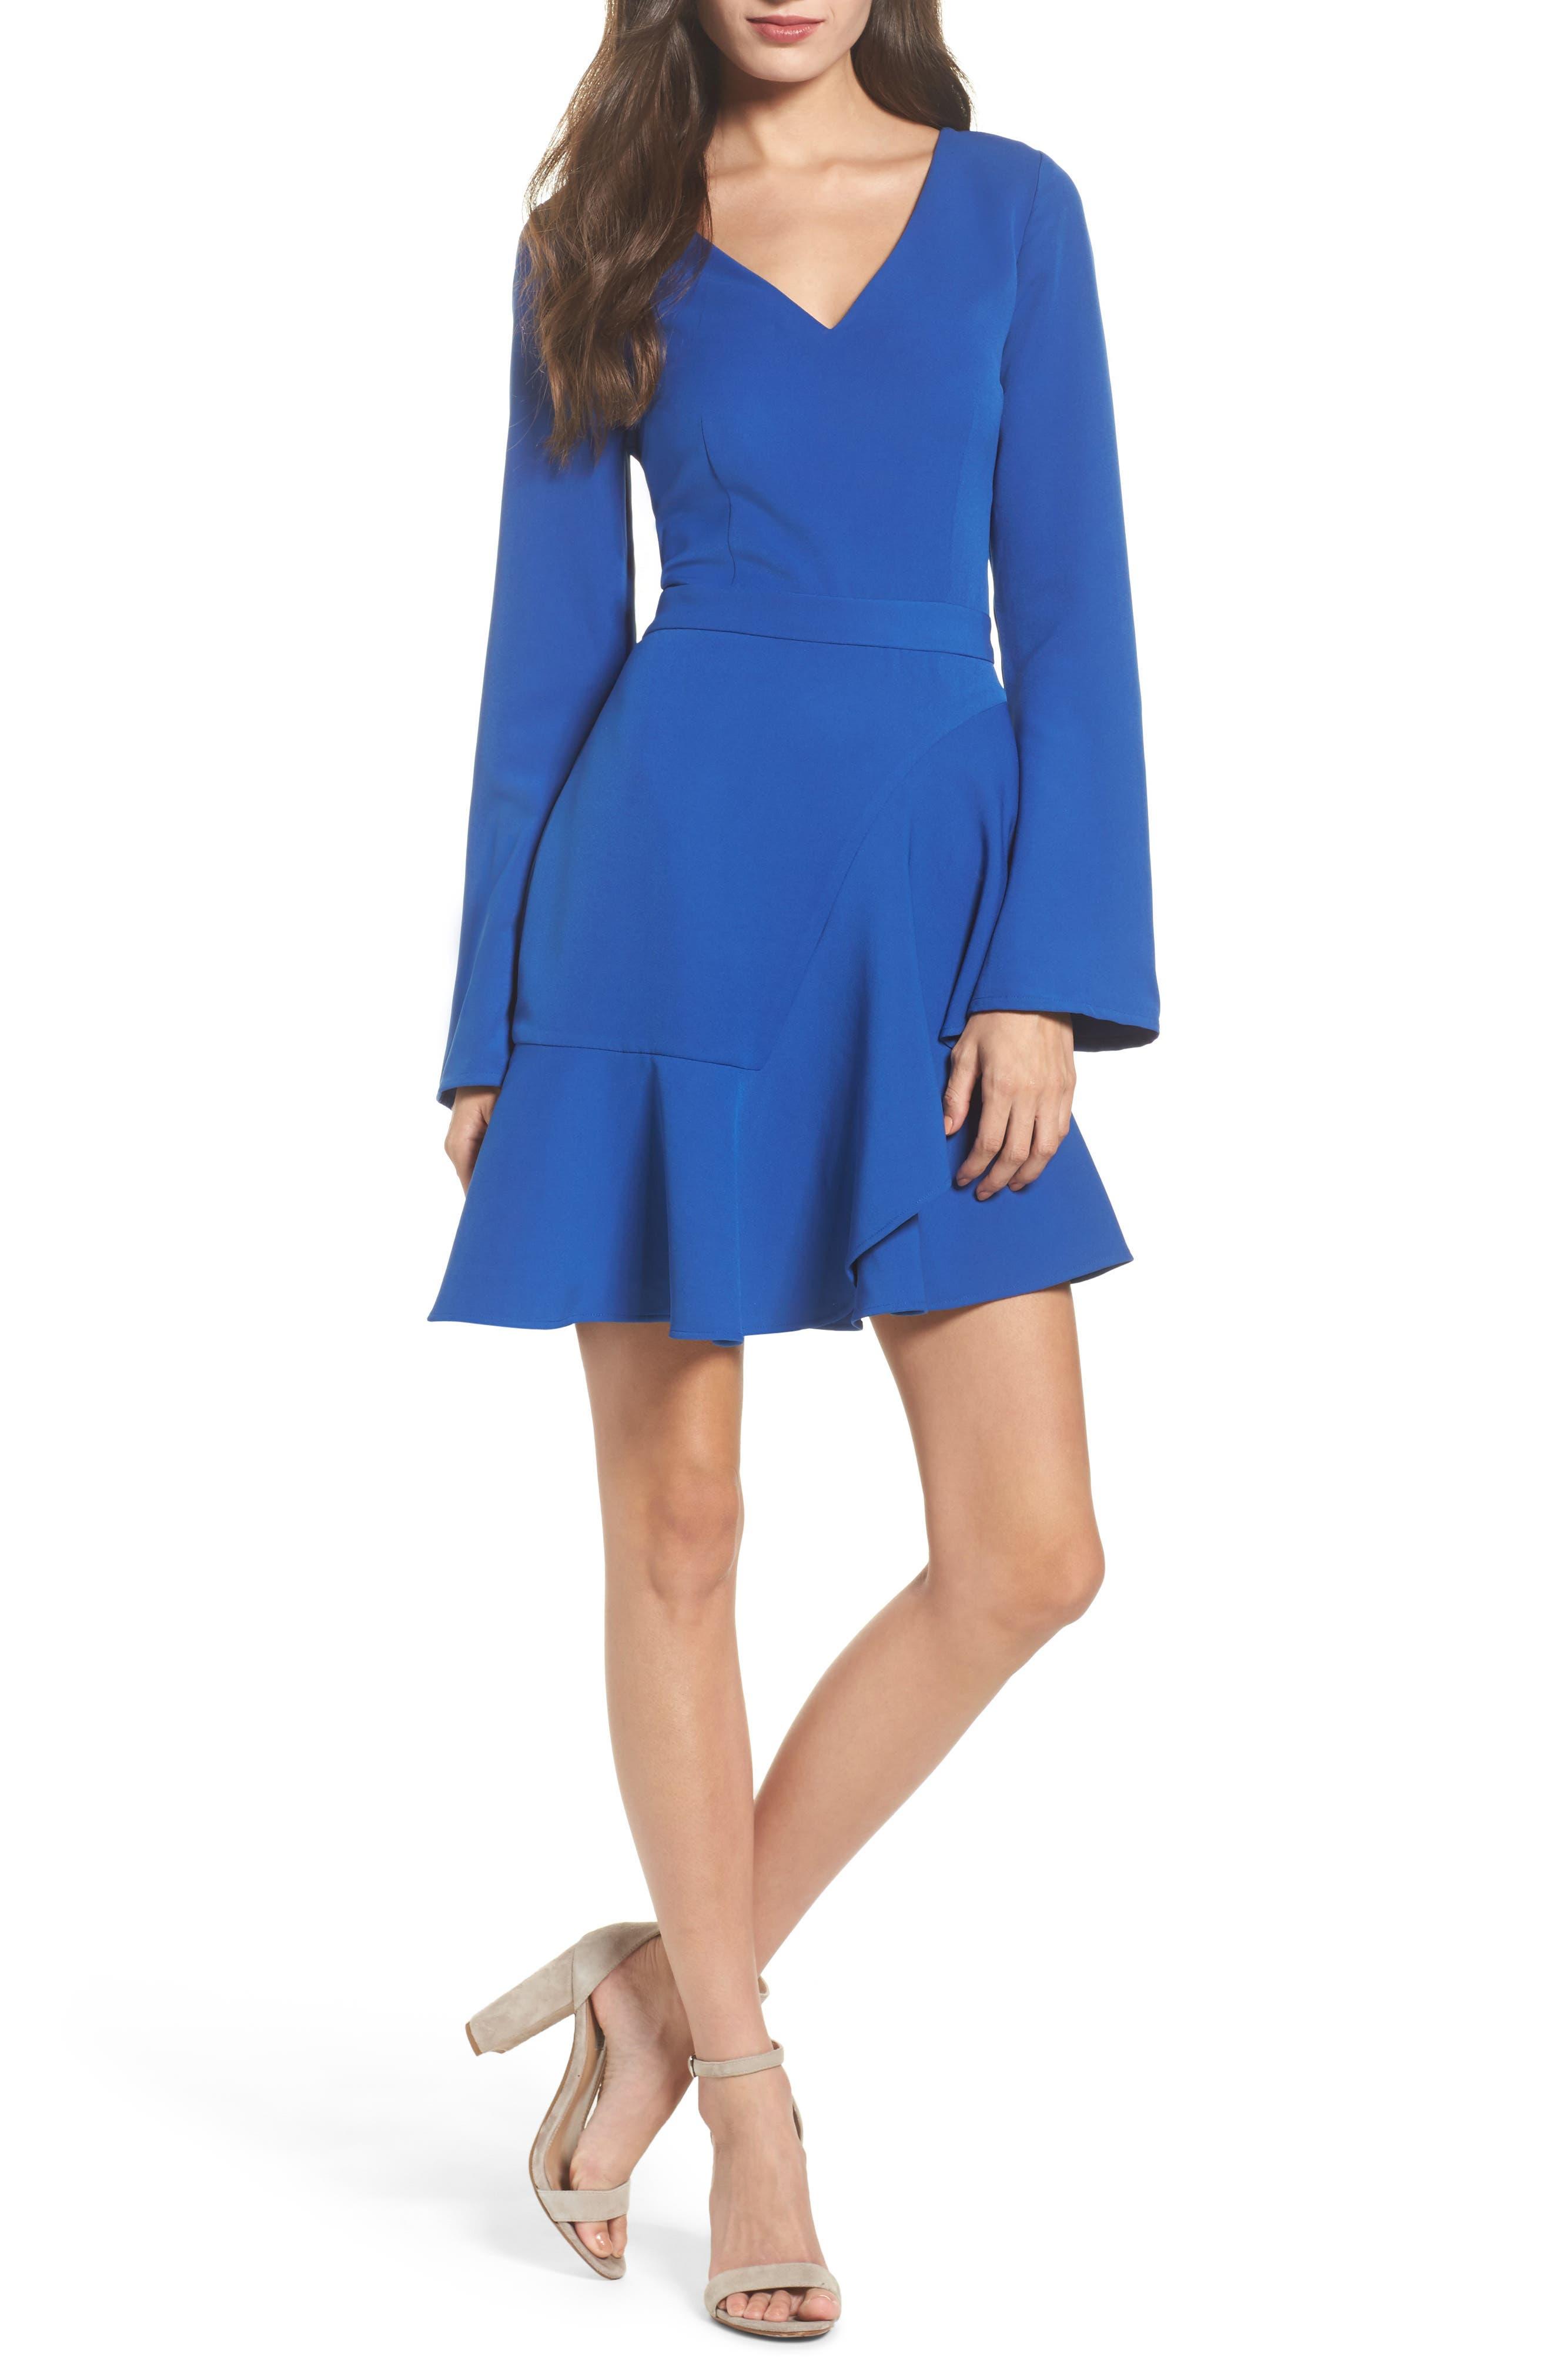 Twilight Tear Minidress,                         Main,                         color, Catalina Blue